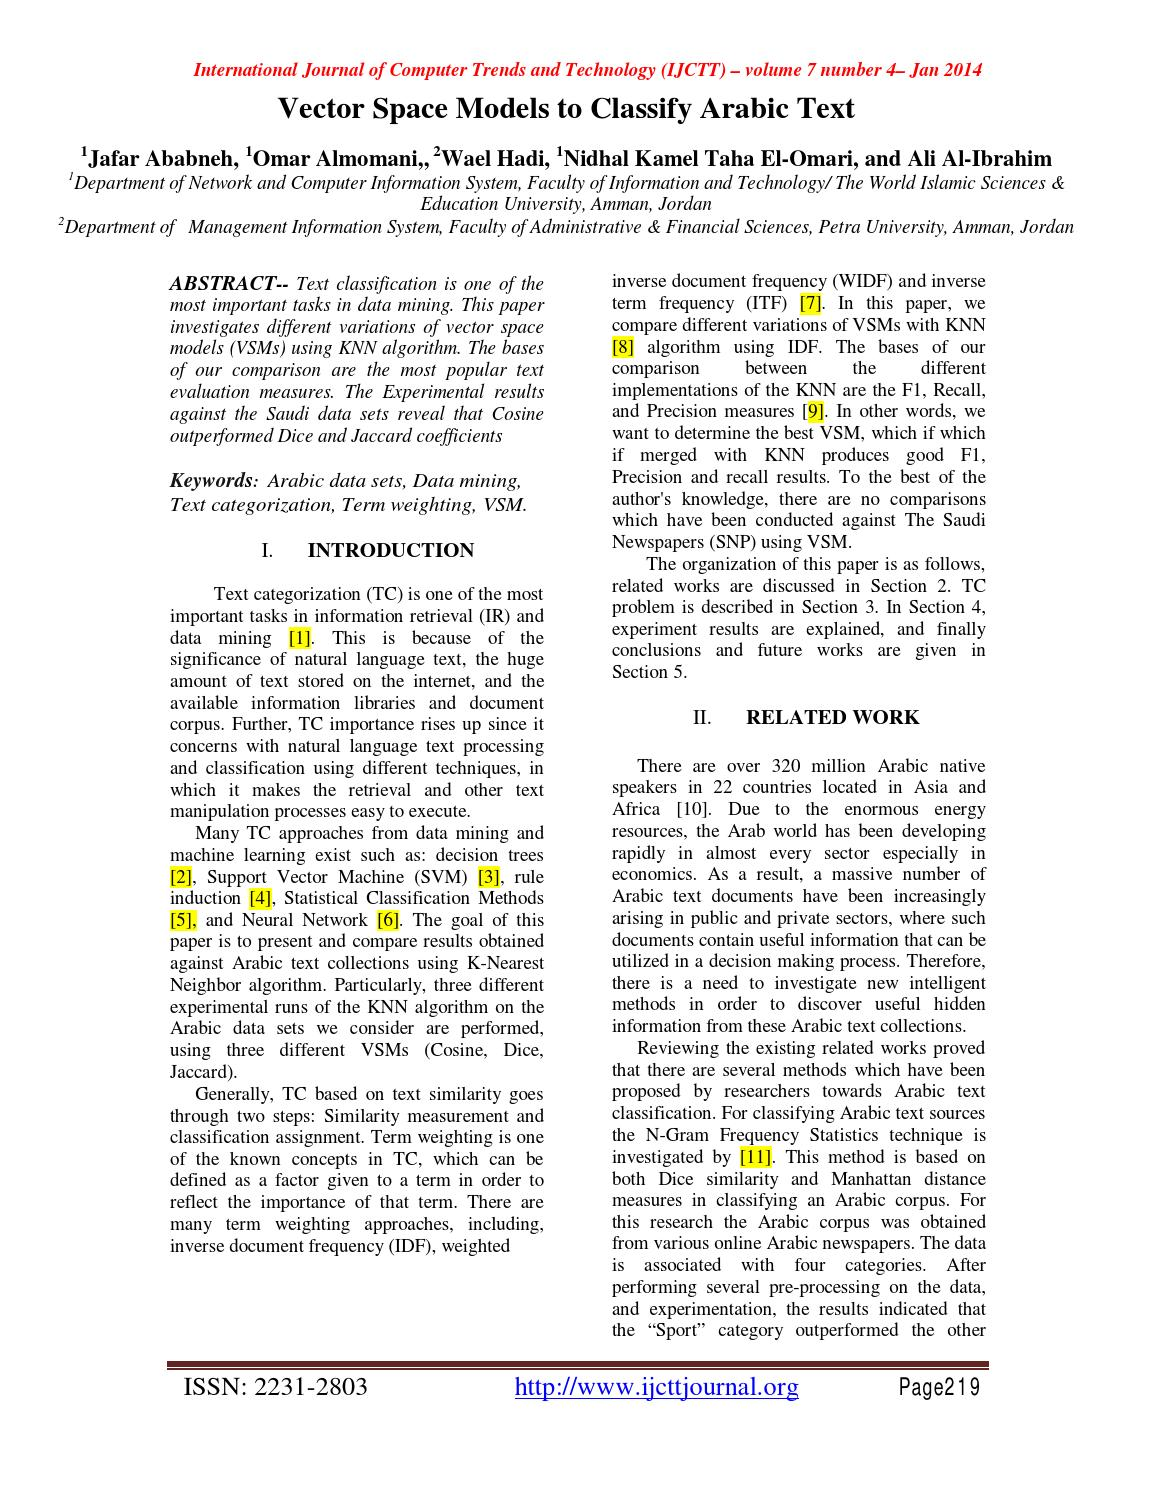 Ijctt v7p109 by Ssrg Journals - issuu